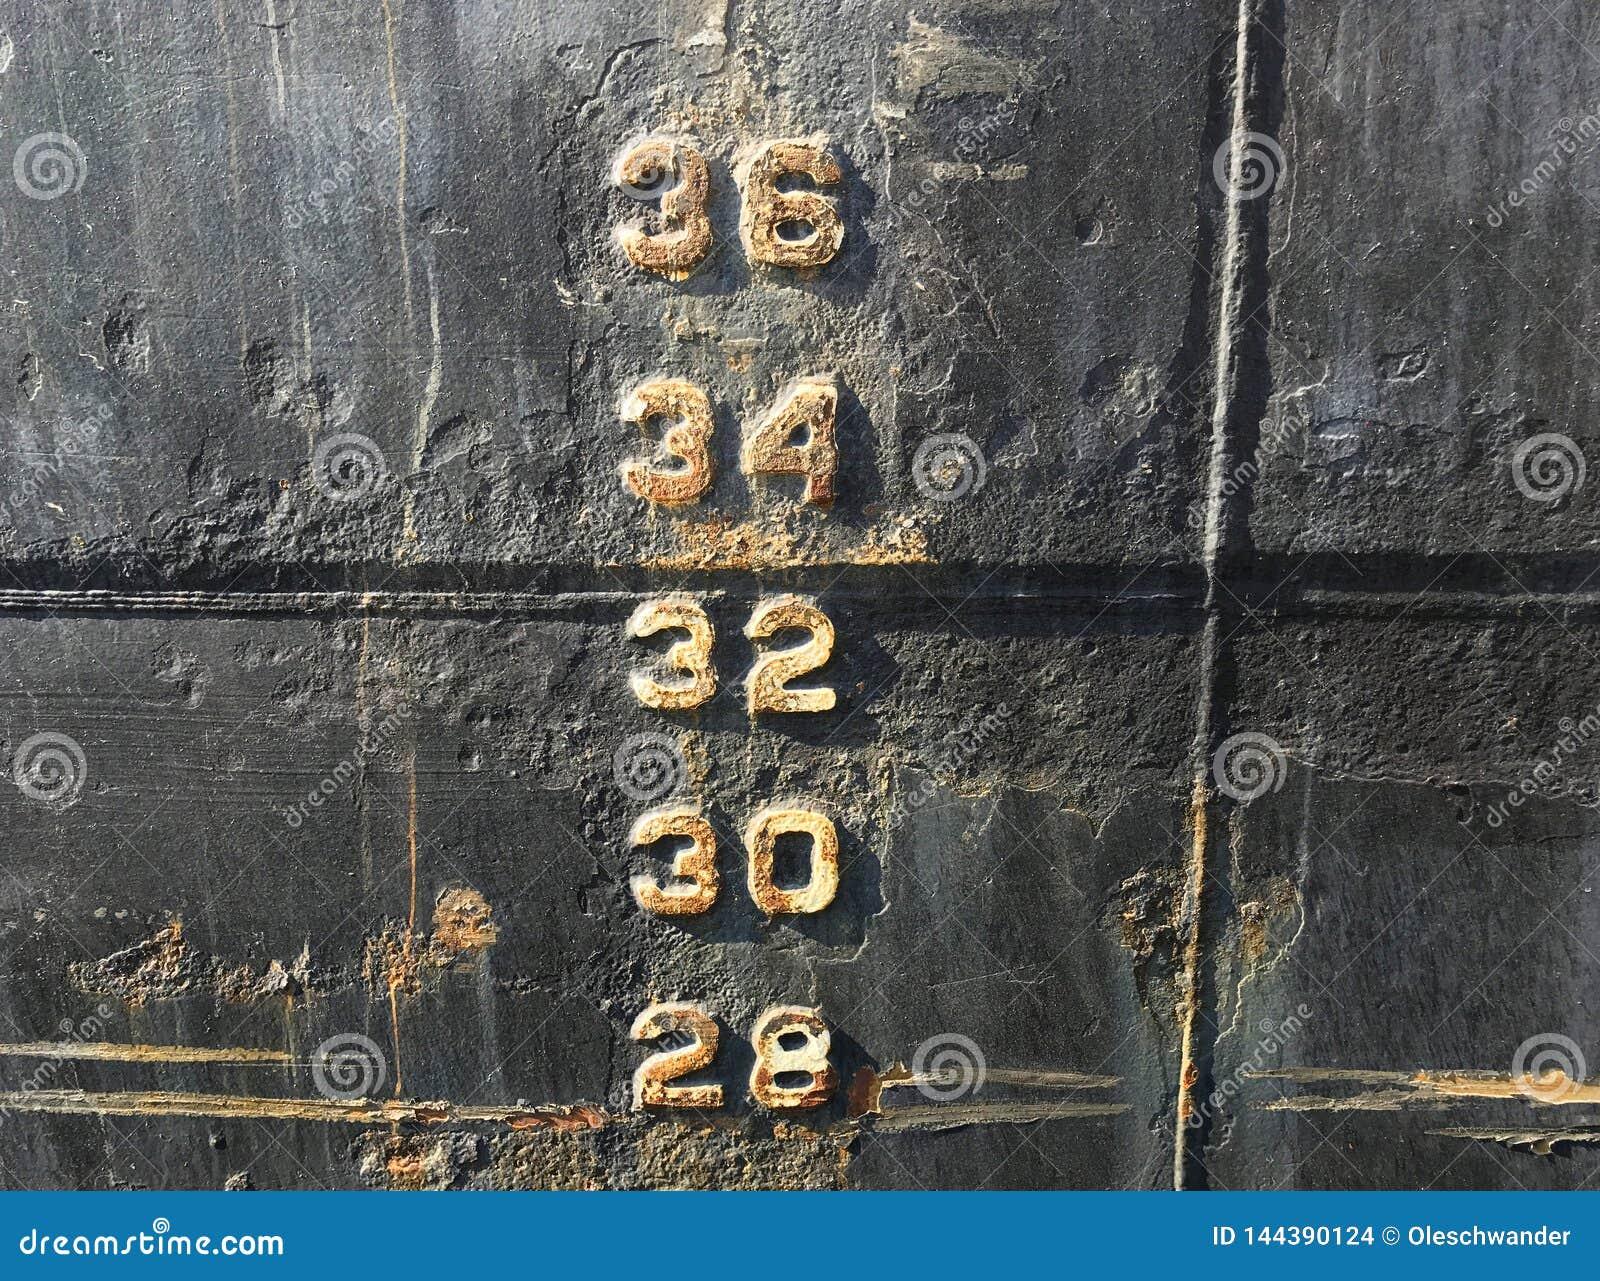 Water level depth gauge number markings on an old black ship hull fragment